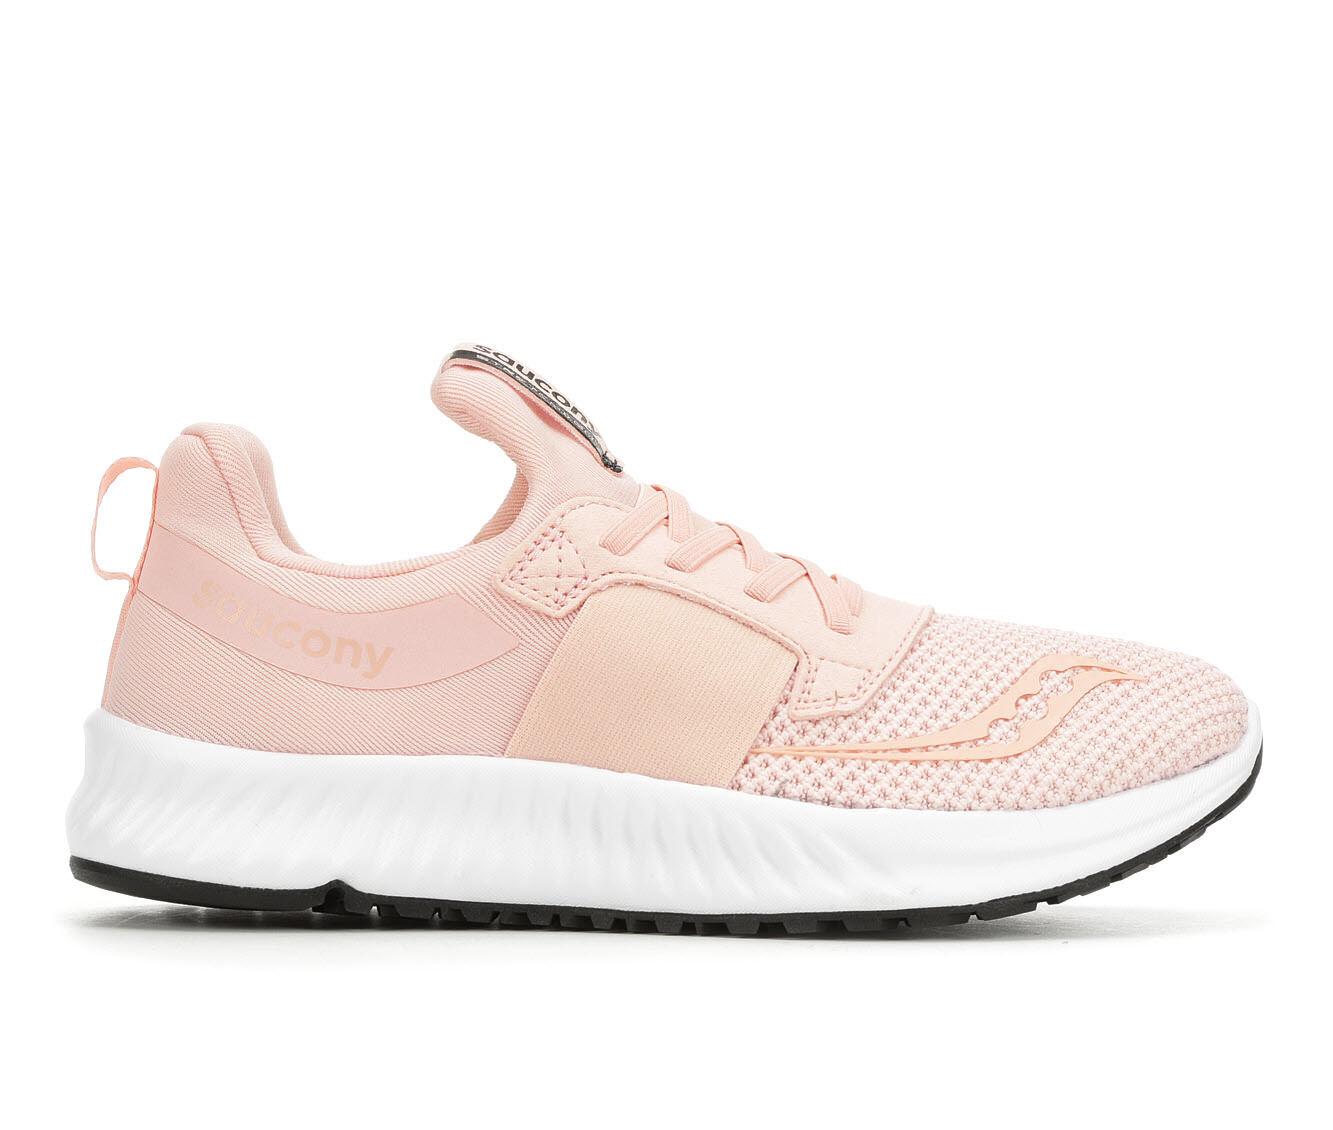 Women's Saucony Breeze Slip-On Sneakers Pink/White